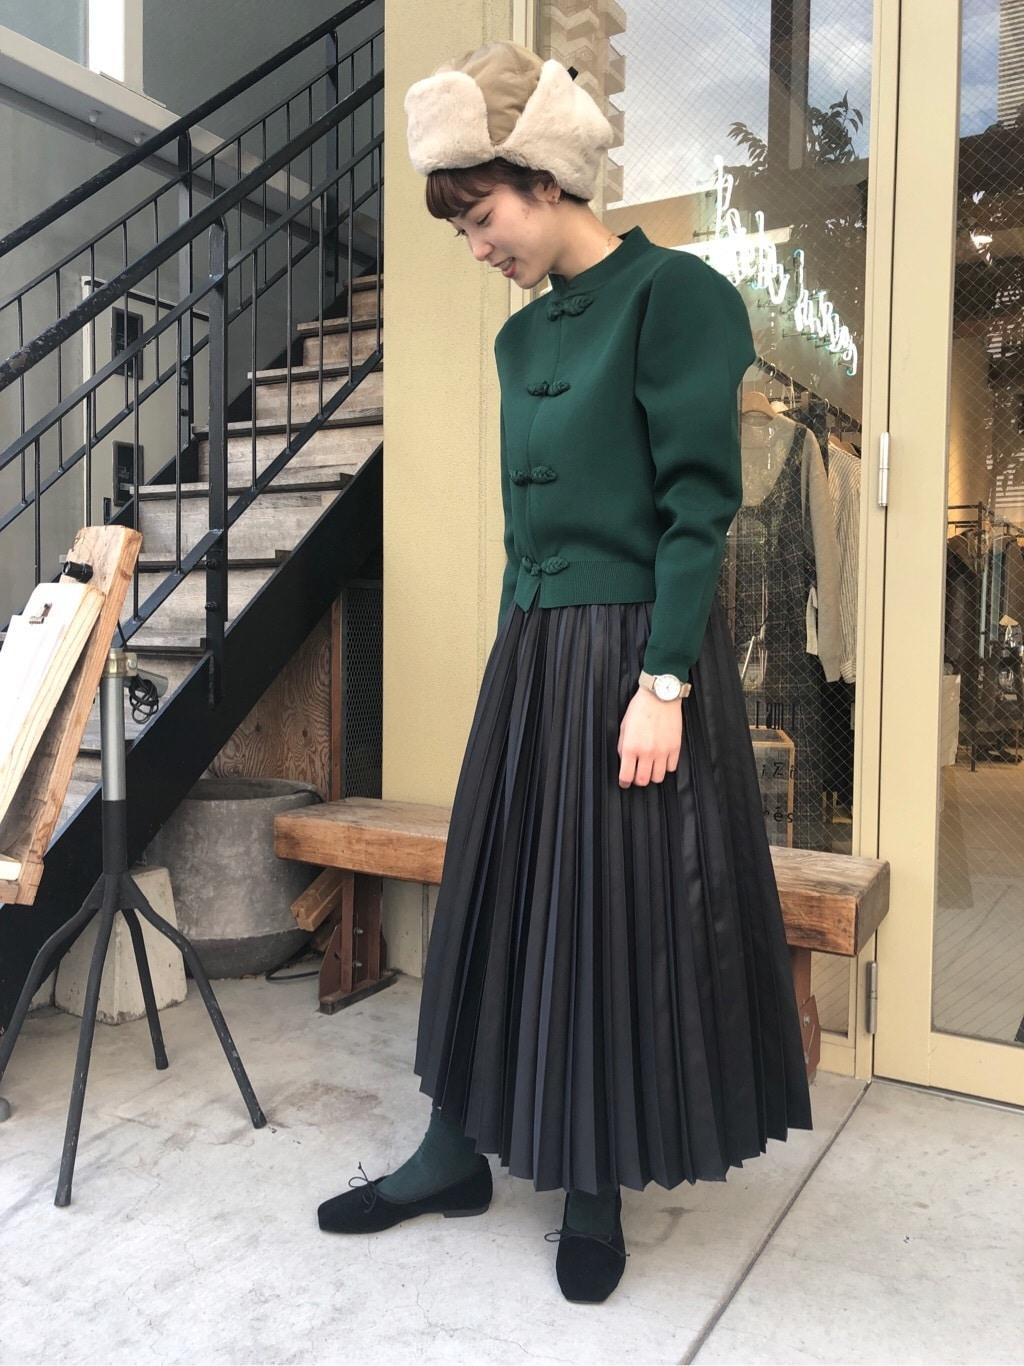 l'atelier du savon 名古屋栄路面 身長:161cm 2019.12.20